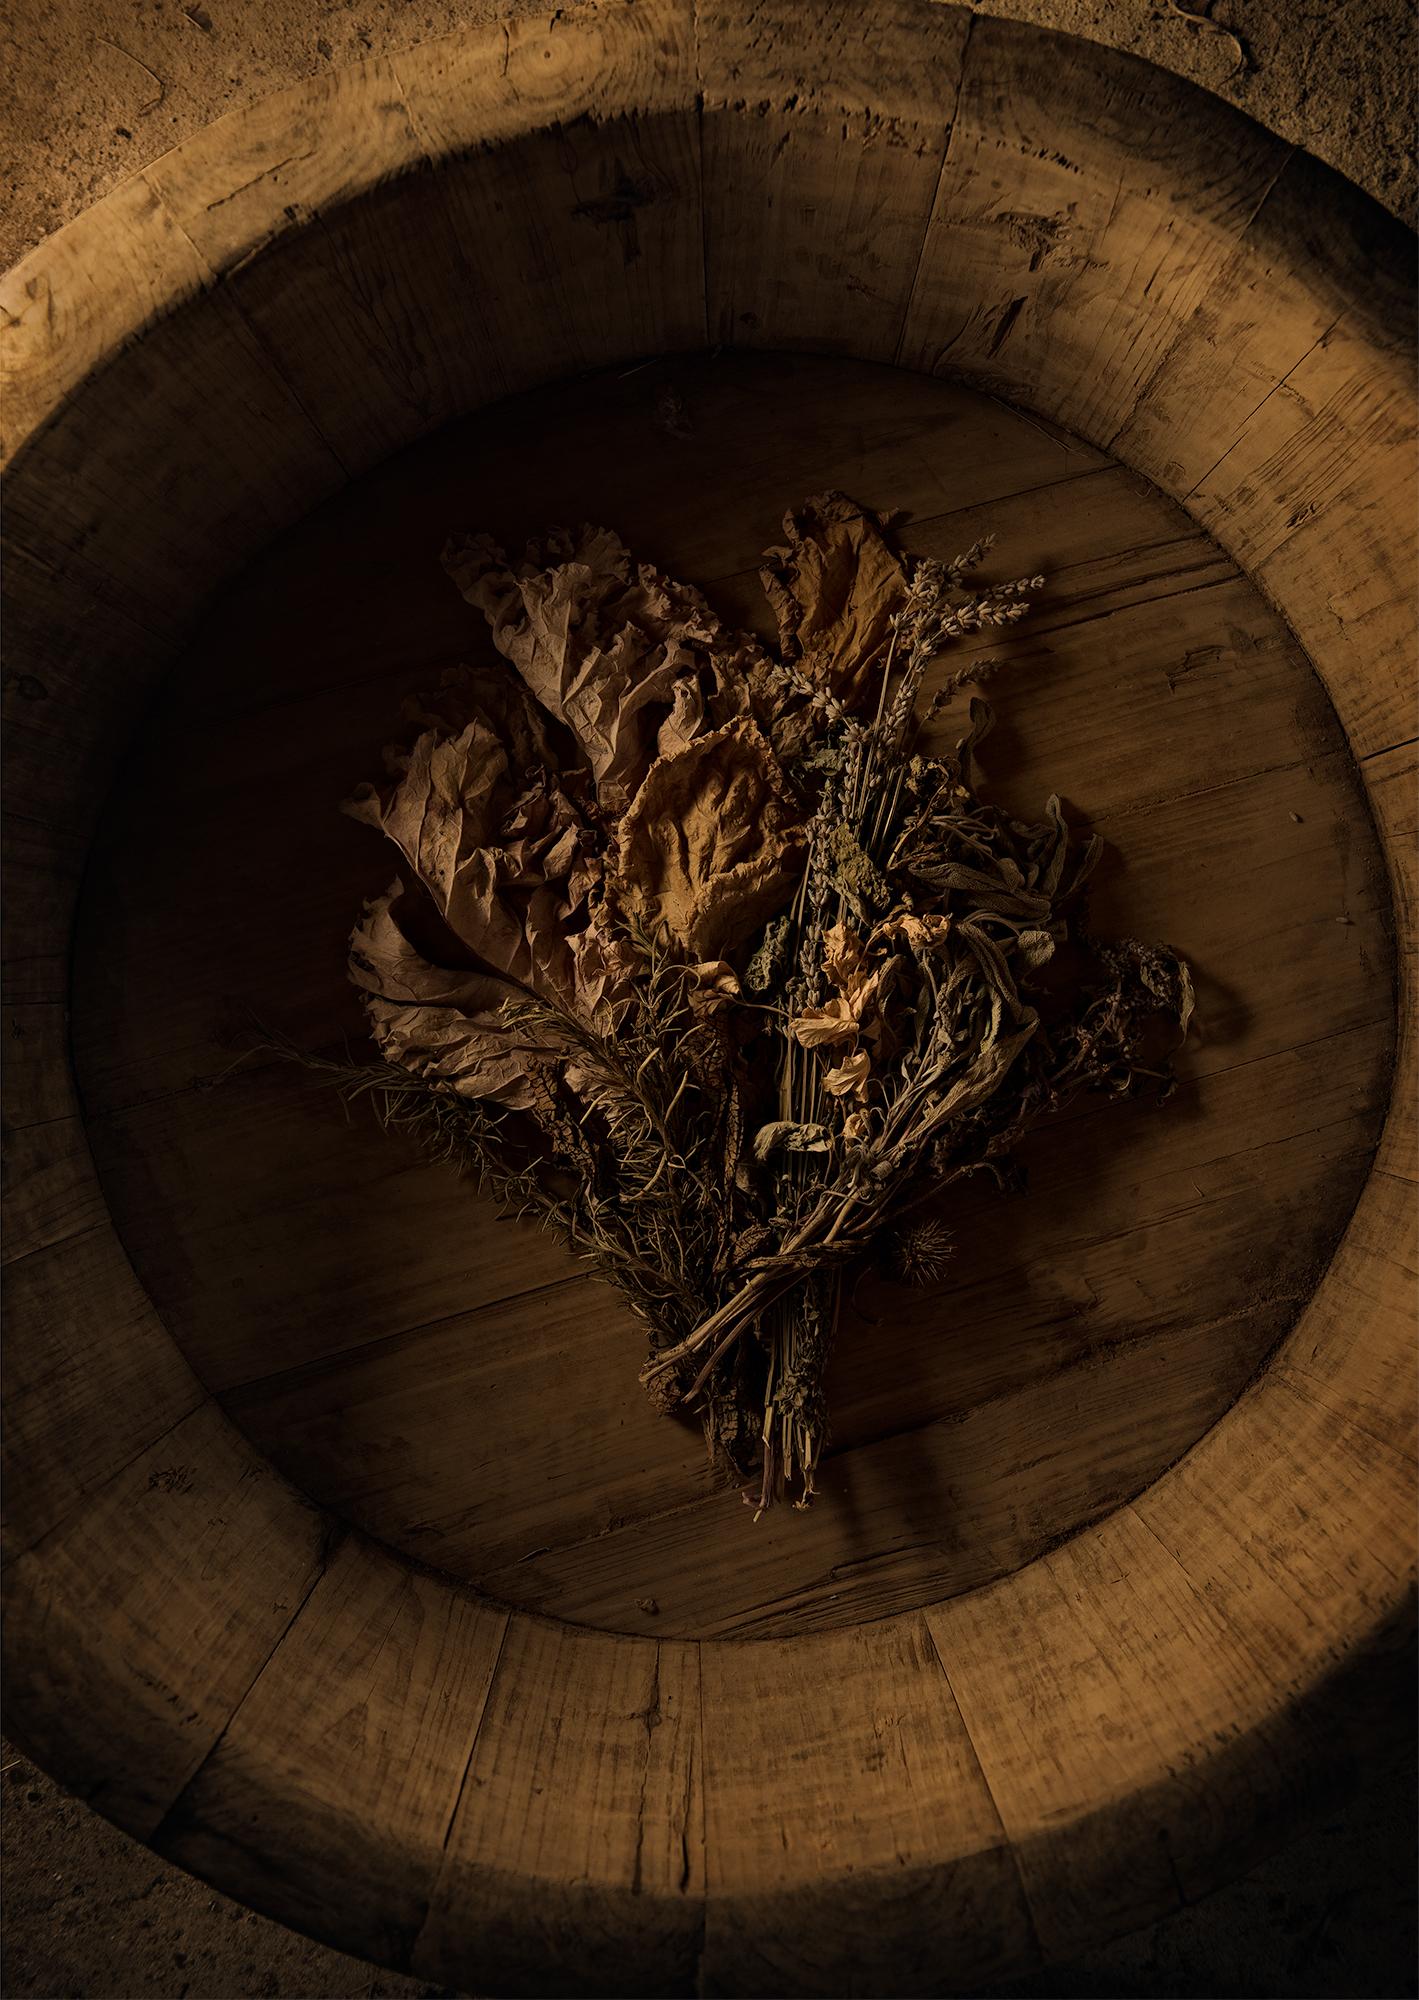 Dried herbs and bowl, Onancock